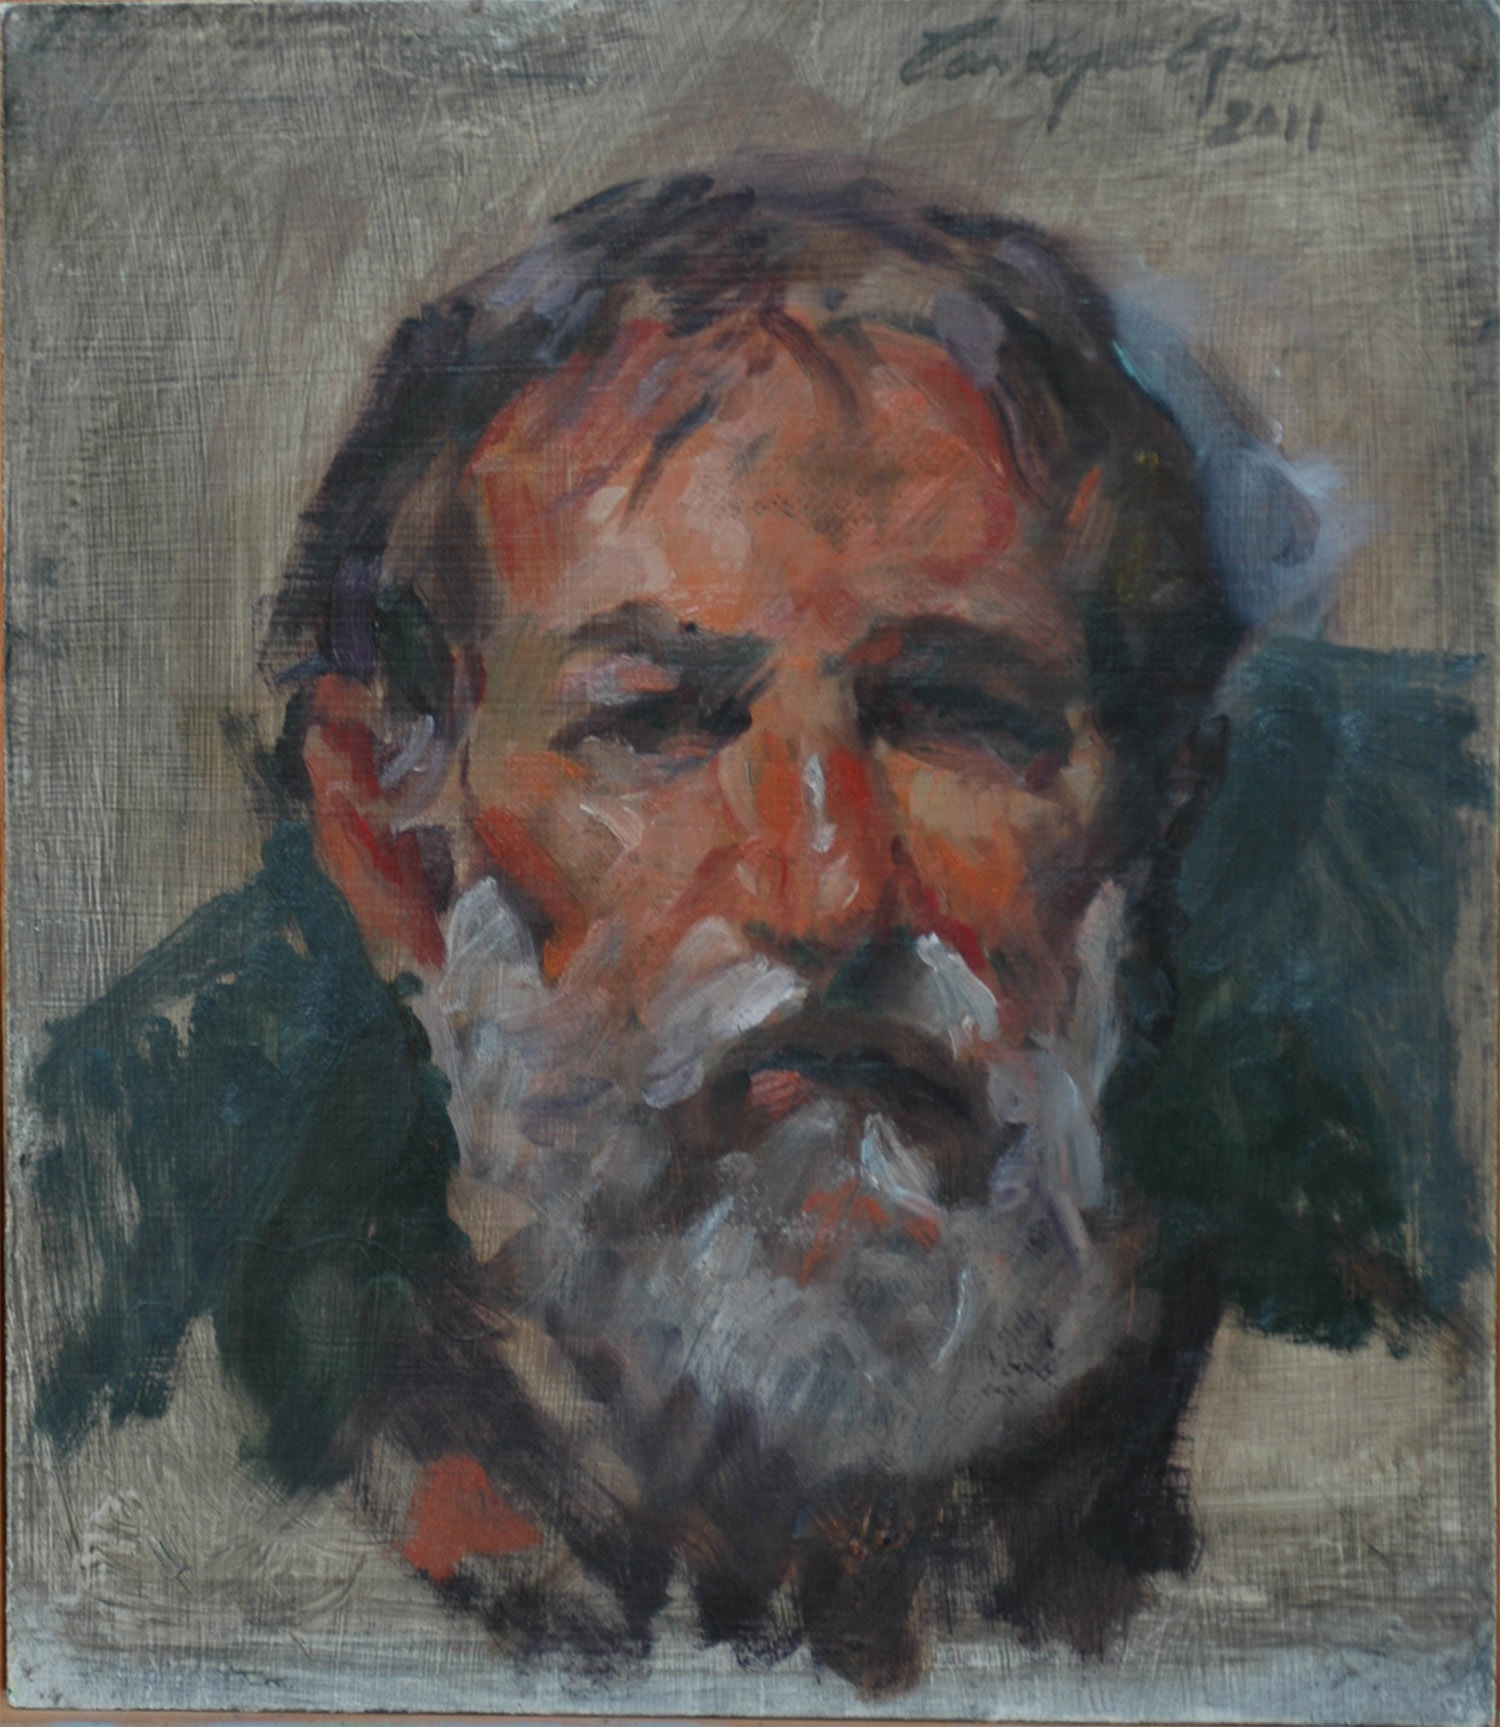 Study for Portrait, 8 x 10, $1,500.00